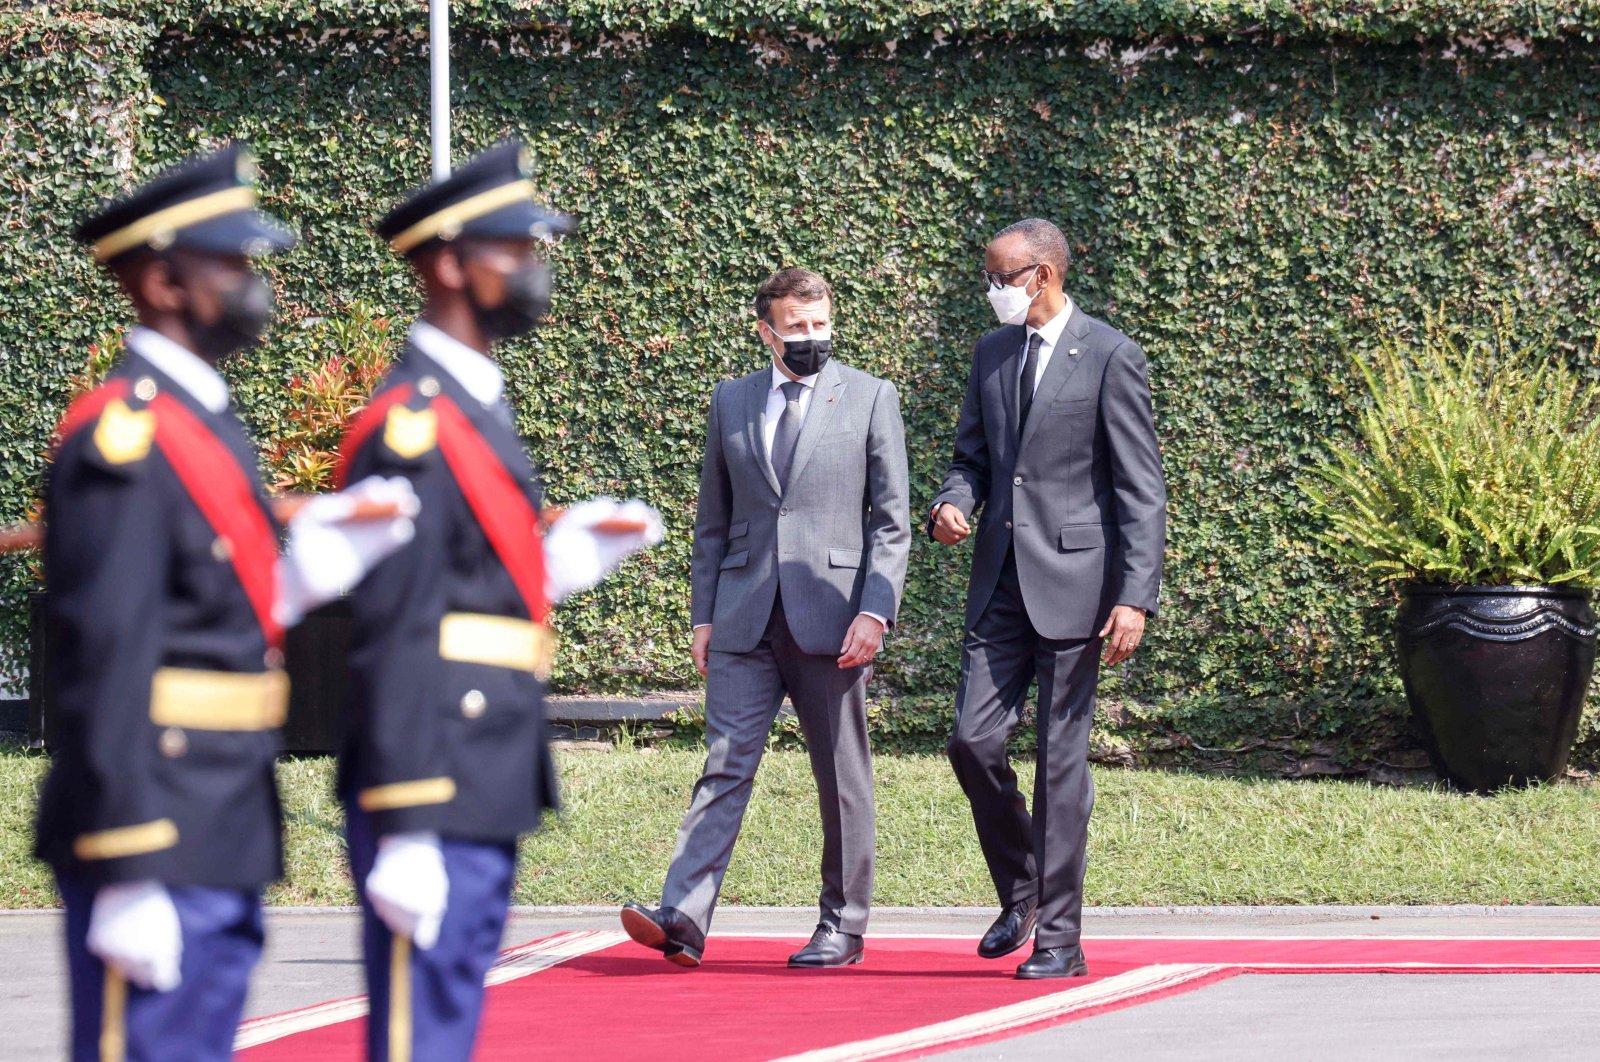 Rwandan President Paul Kagame (R) receives French President Emmanuel Macron at the Presidential Palace in Kigali, Rwanda, May 27, 2021. (AFP Photo)